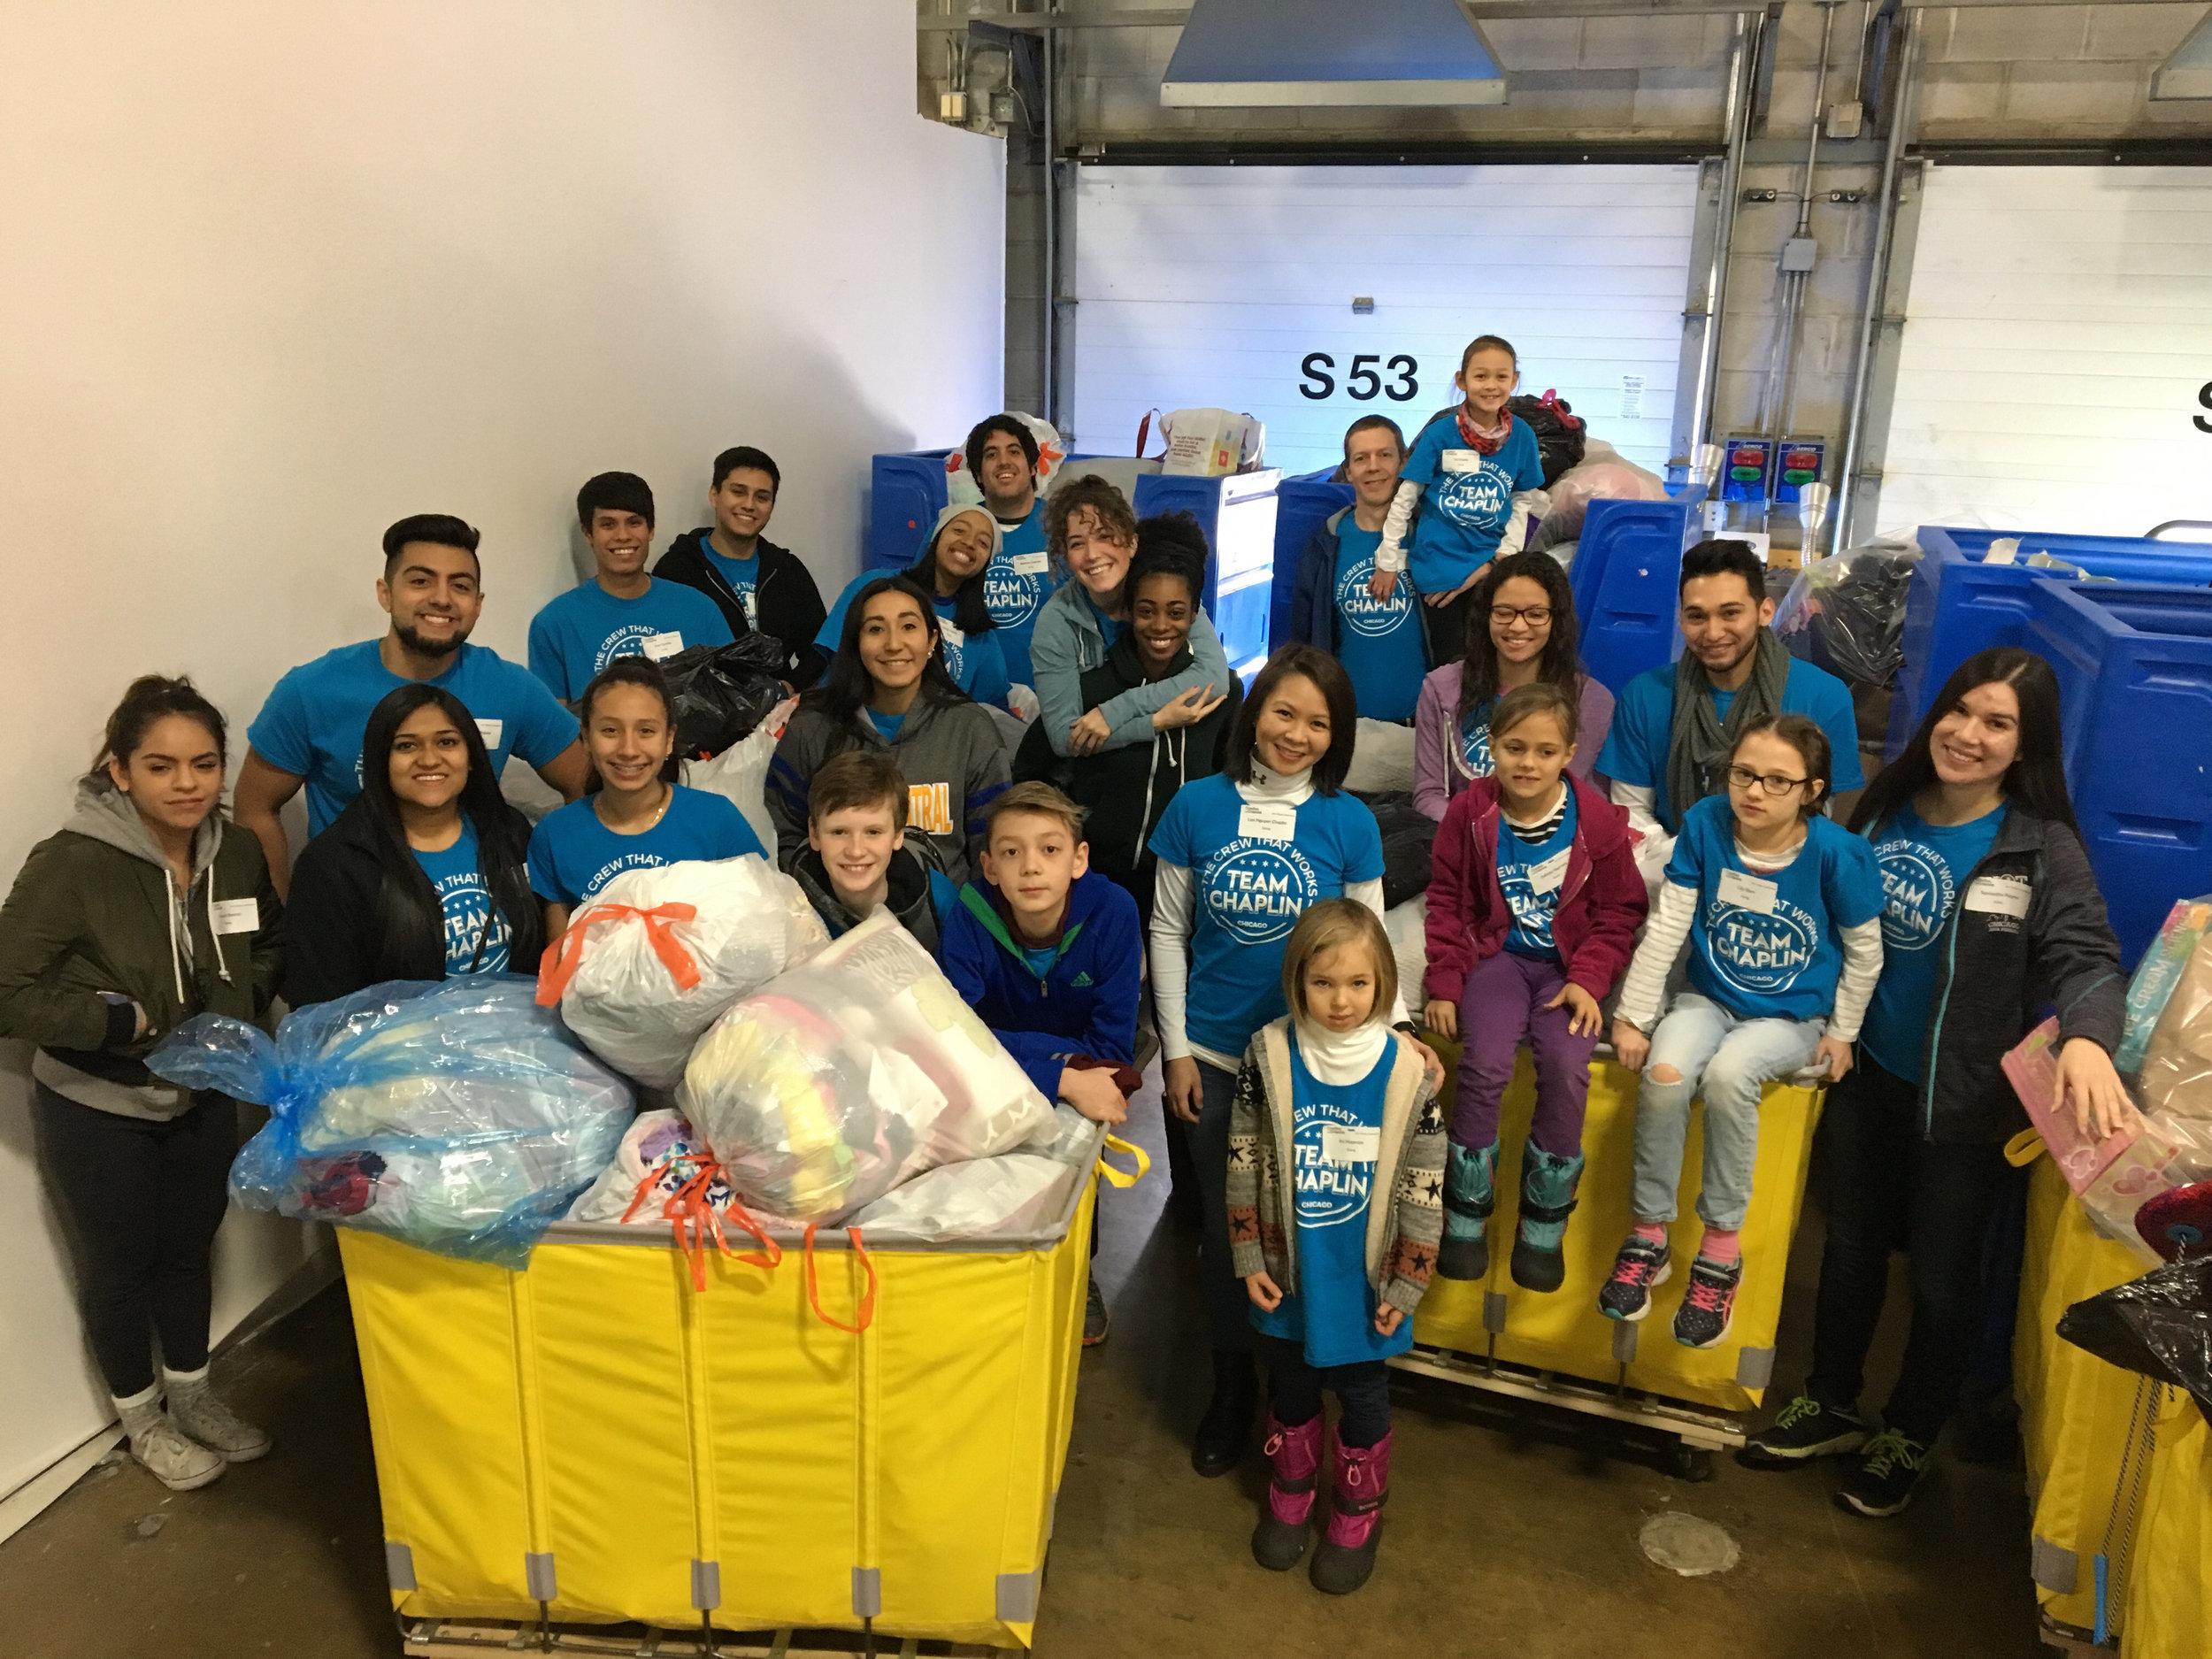 December 2017: Team volunteer shift at Cradles to Crayons